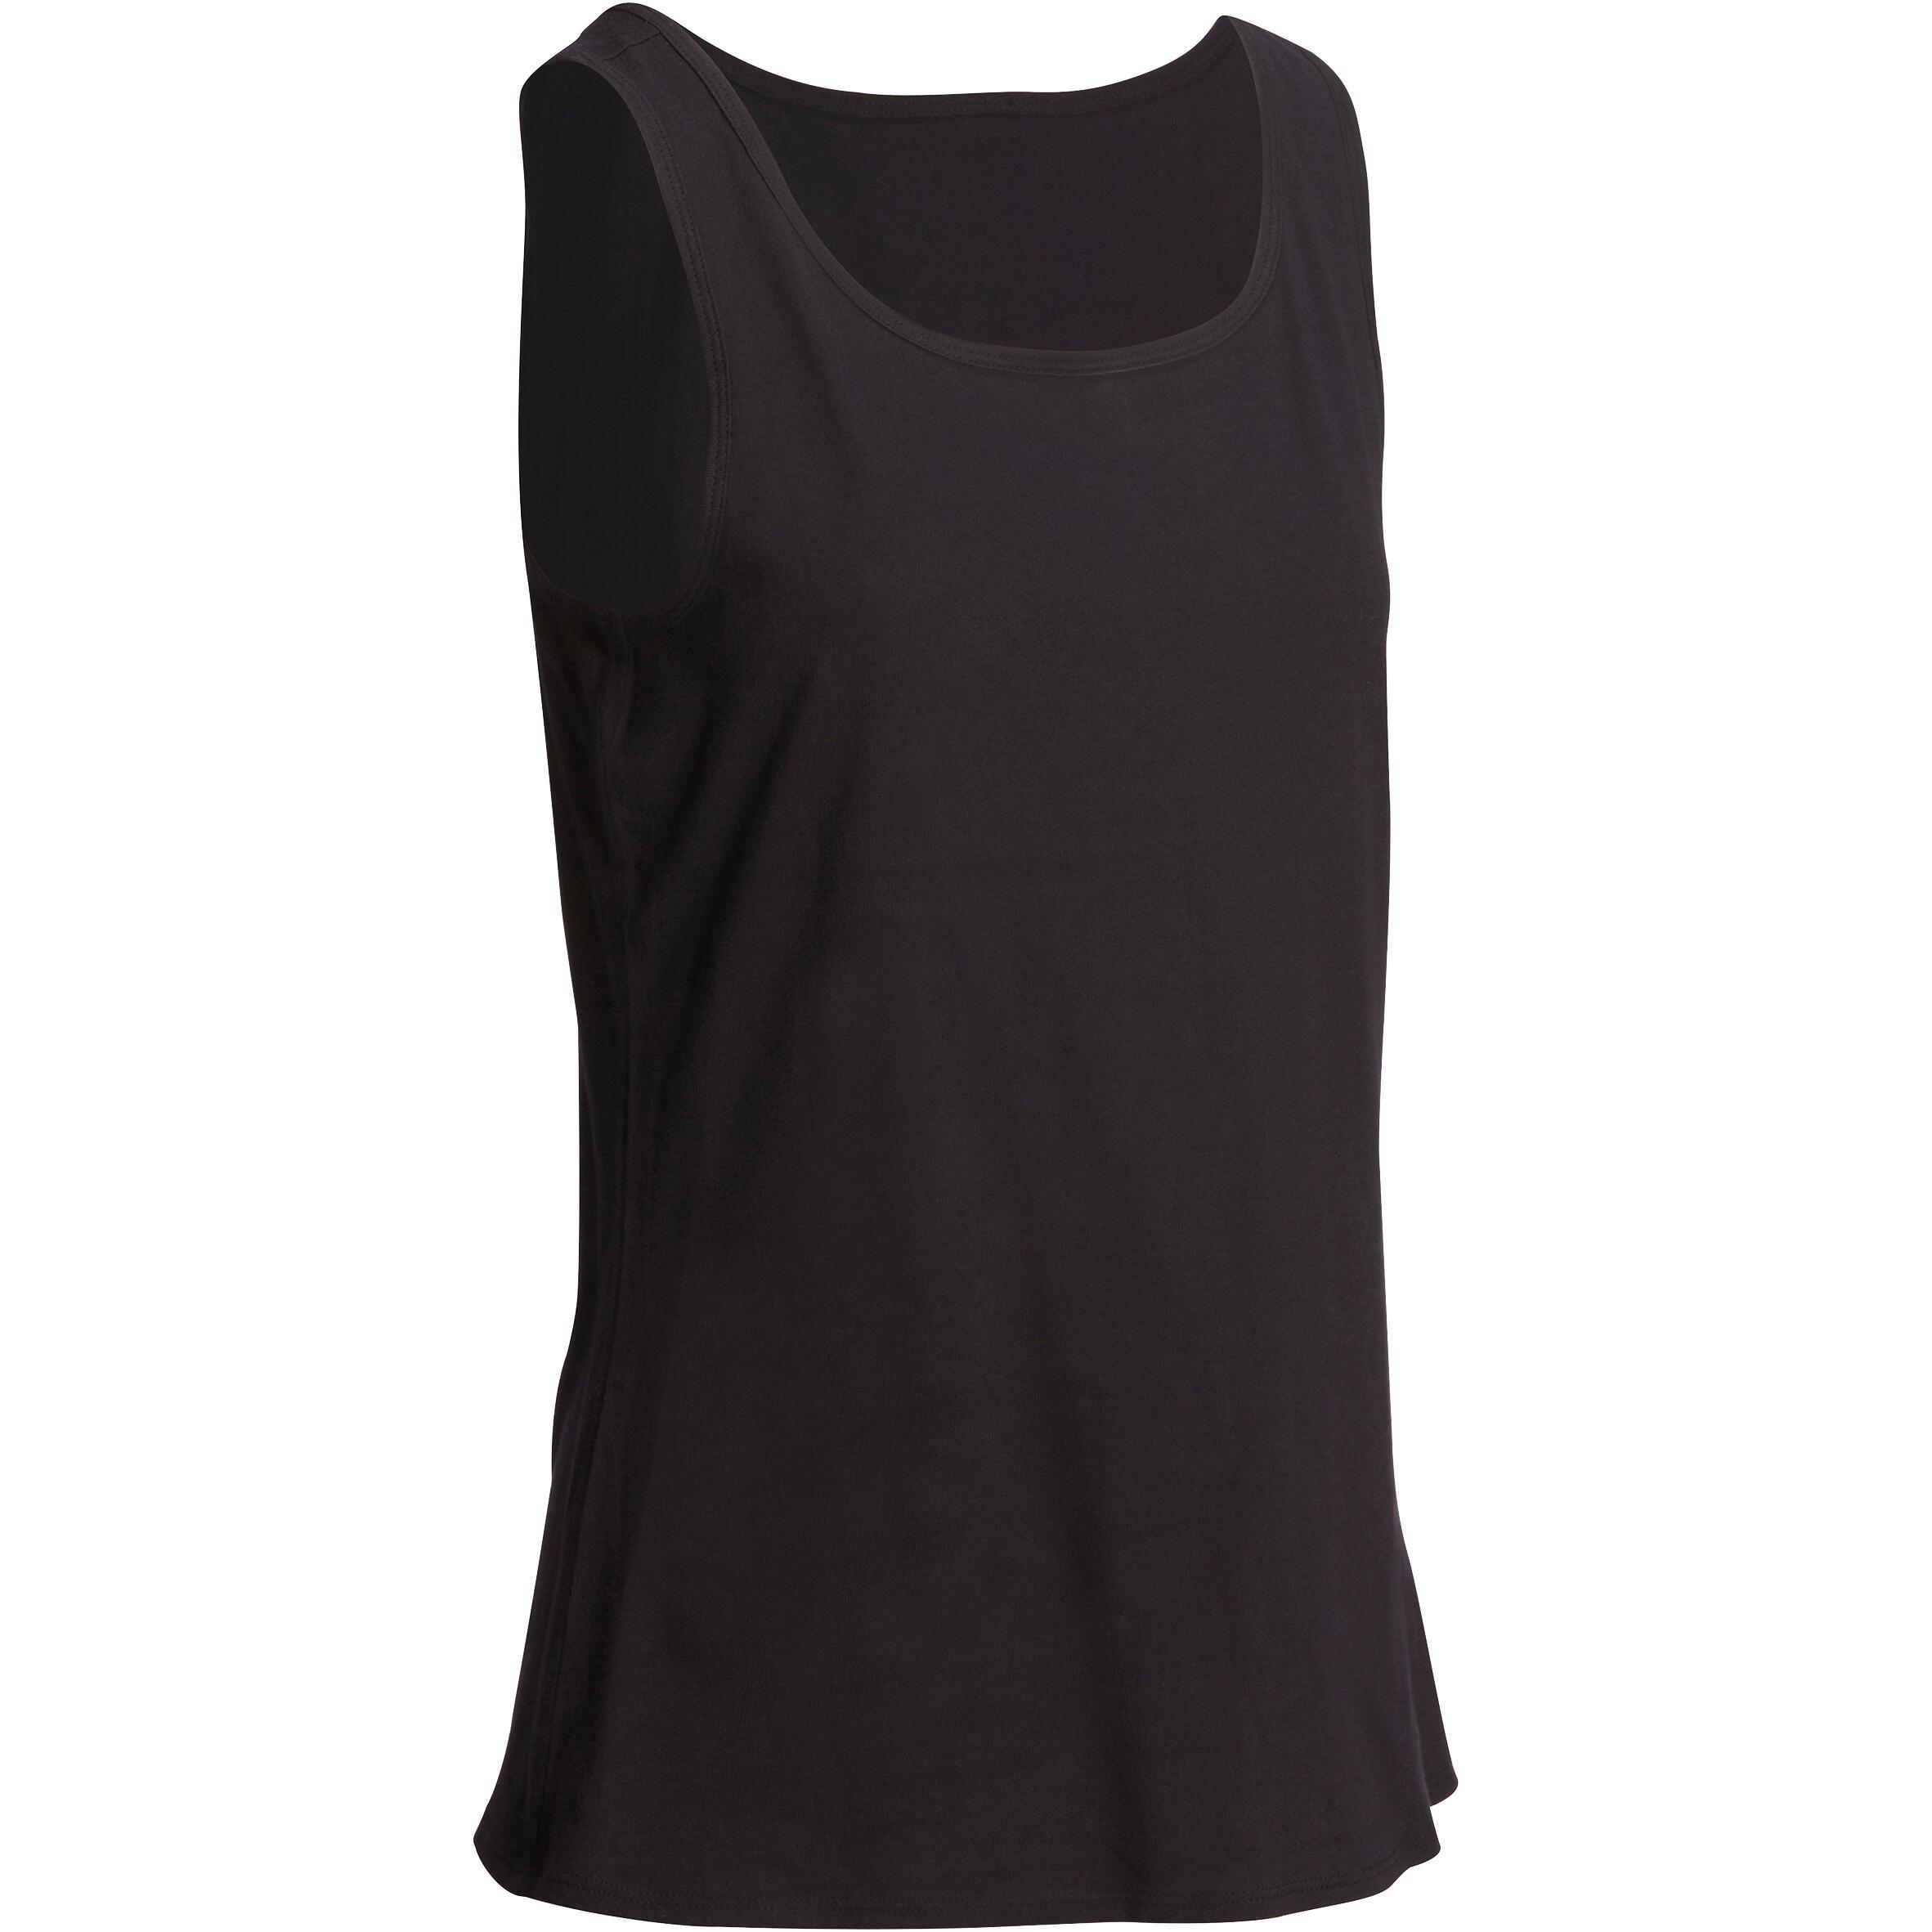 Camiseta sin mangas gimnasia y pilates mujer negro